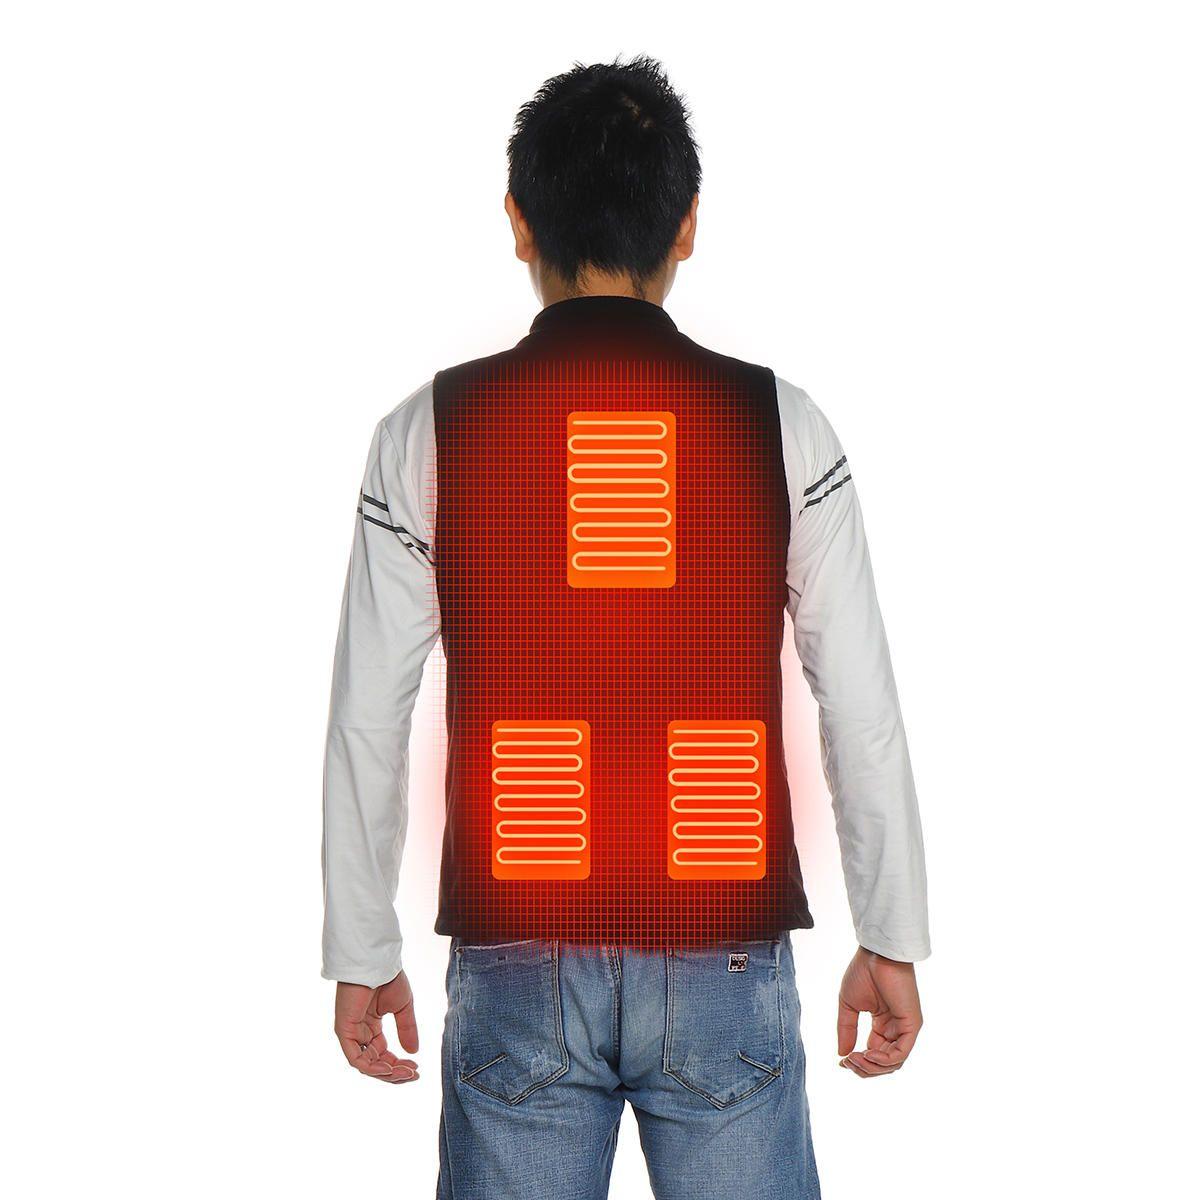 Electric Heated Vest Jacket USB Warm Up Heating Pad Body Warmer Clothing Men UK